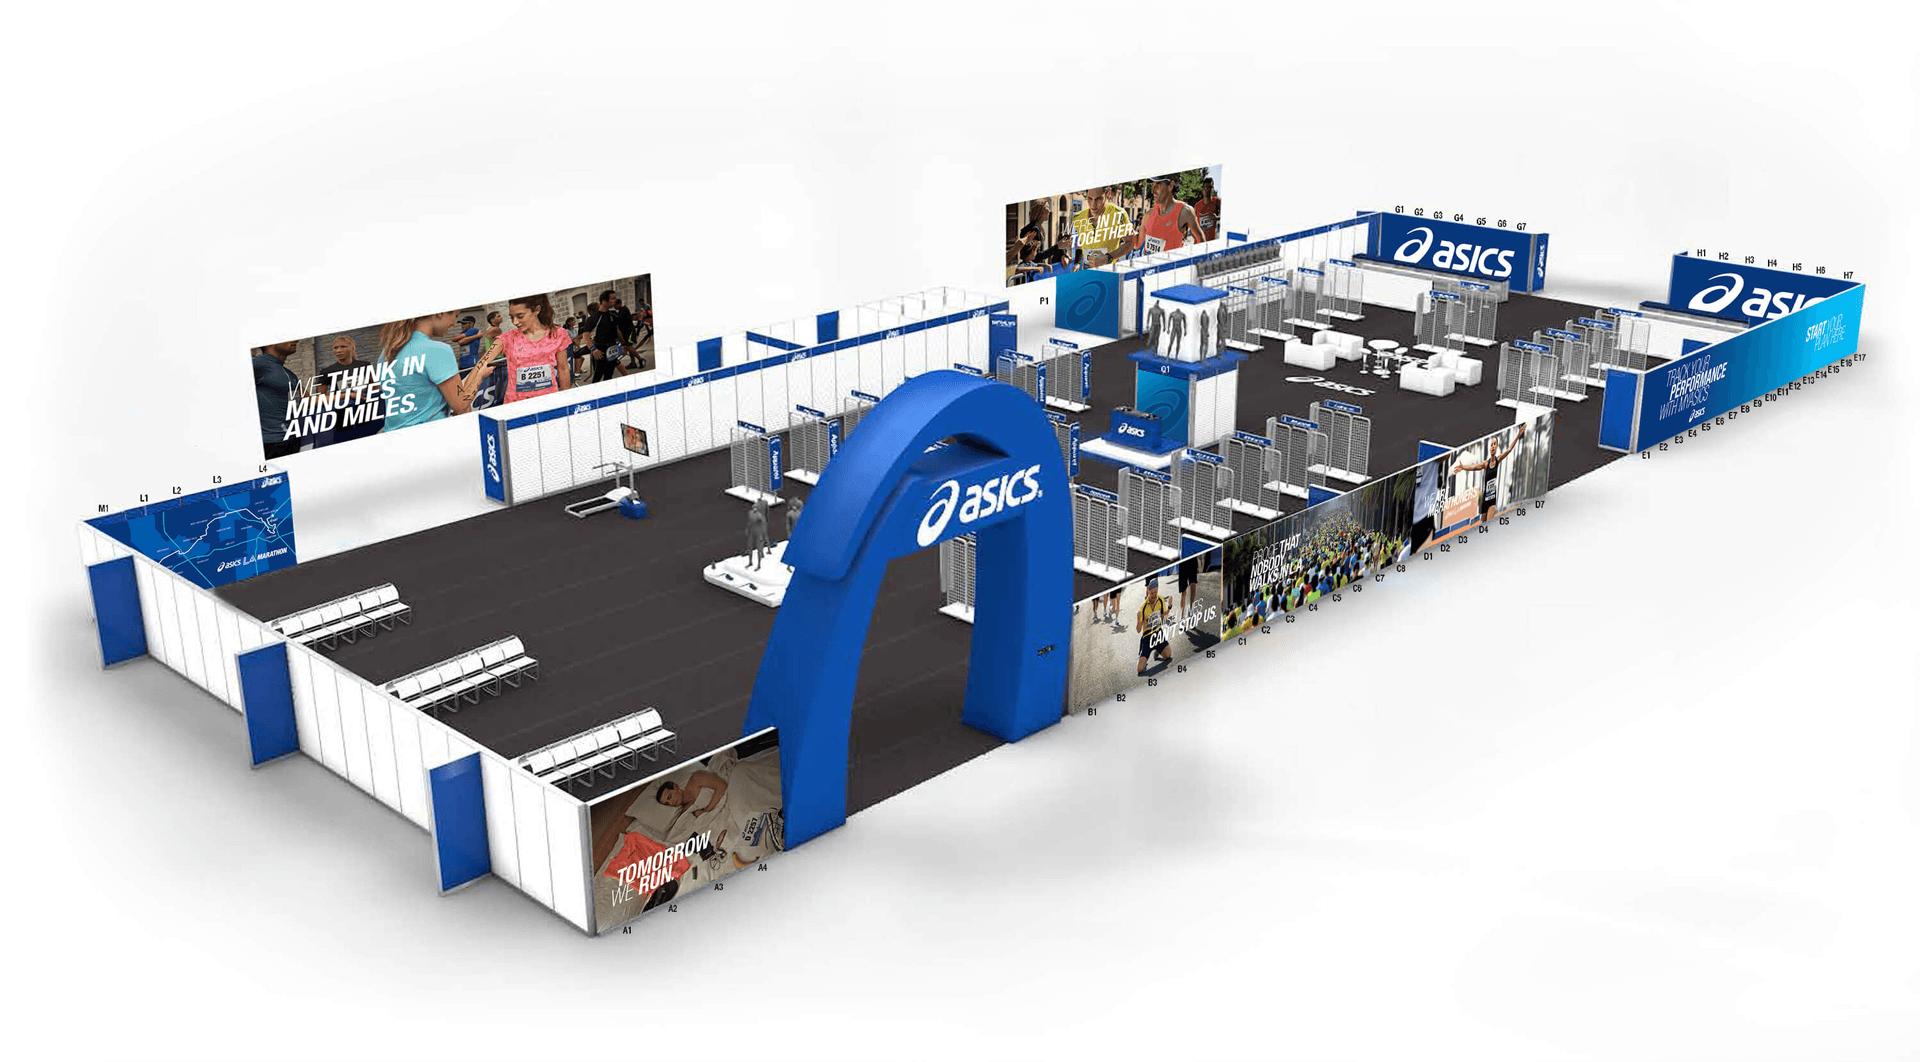 ASICS image of brand booth mockup